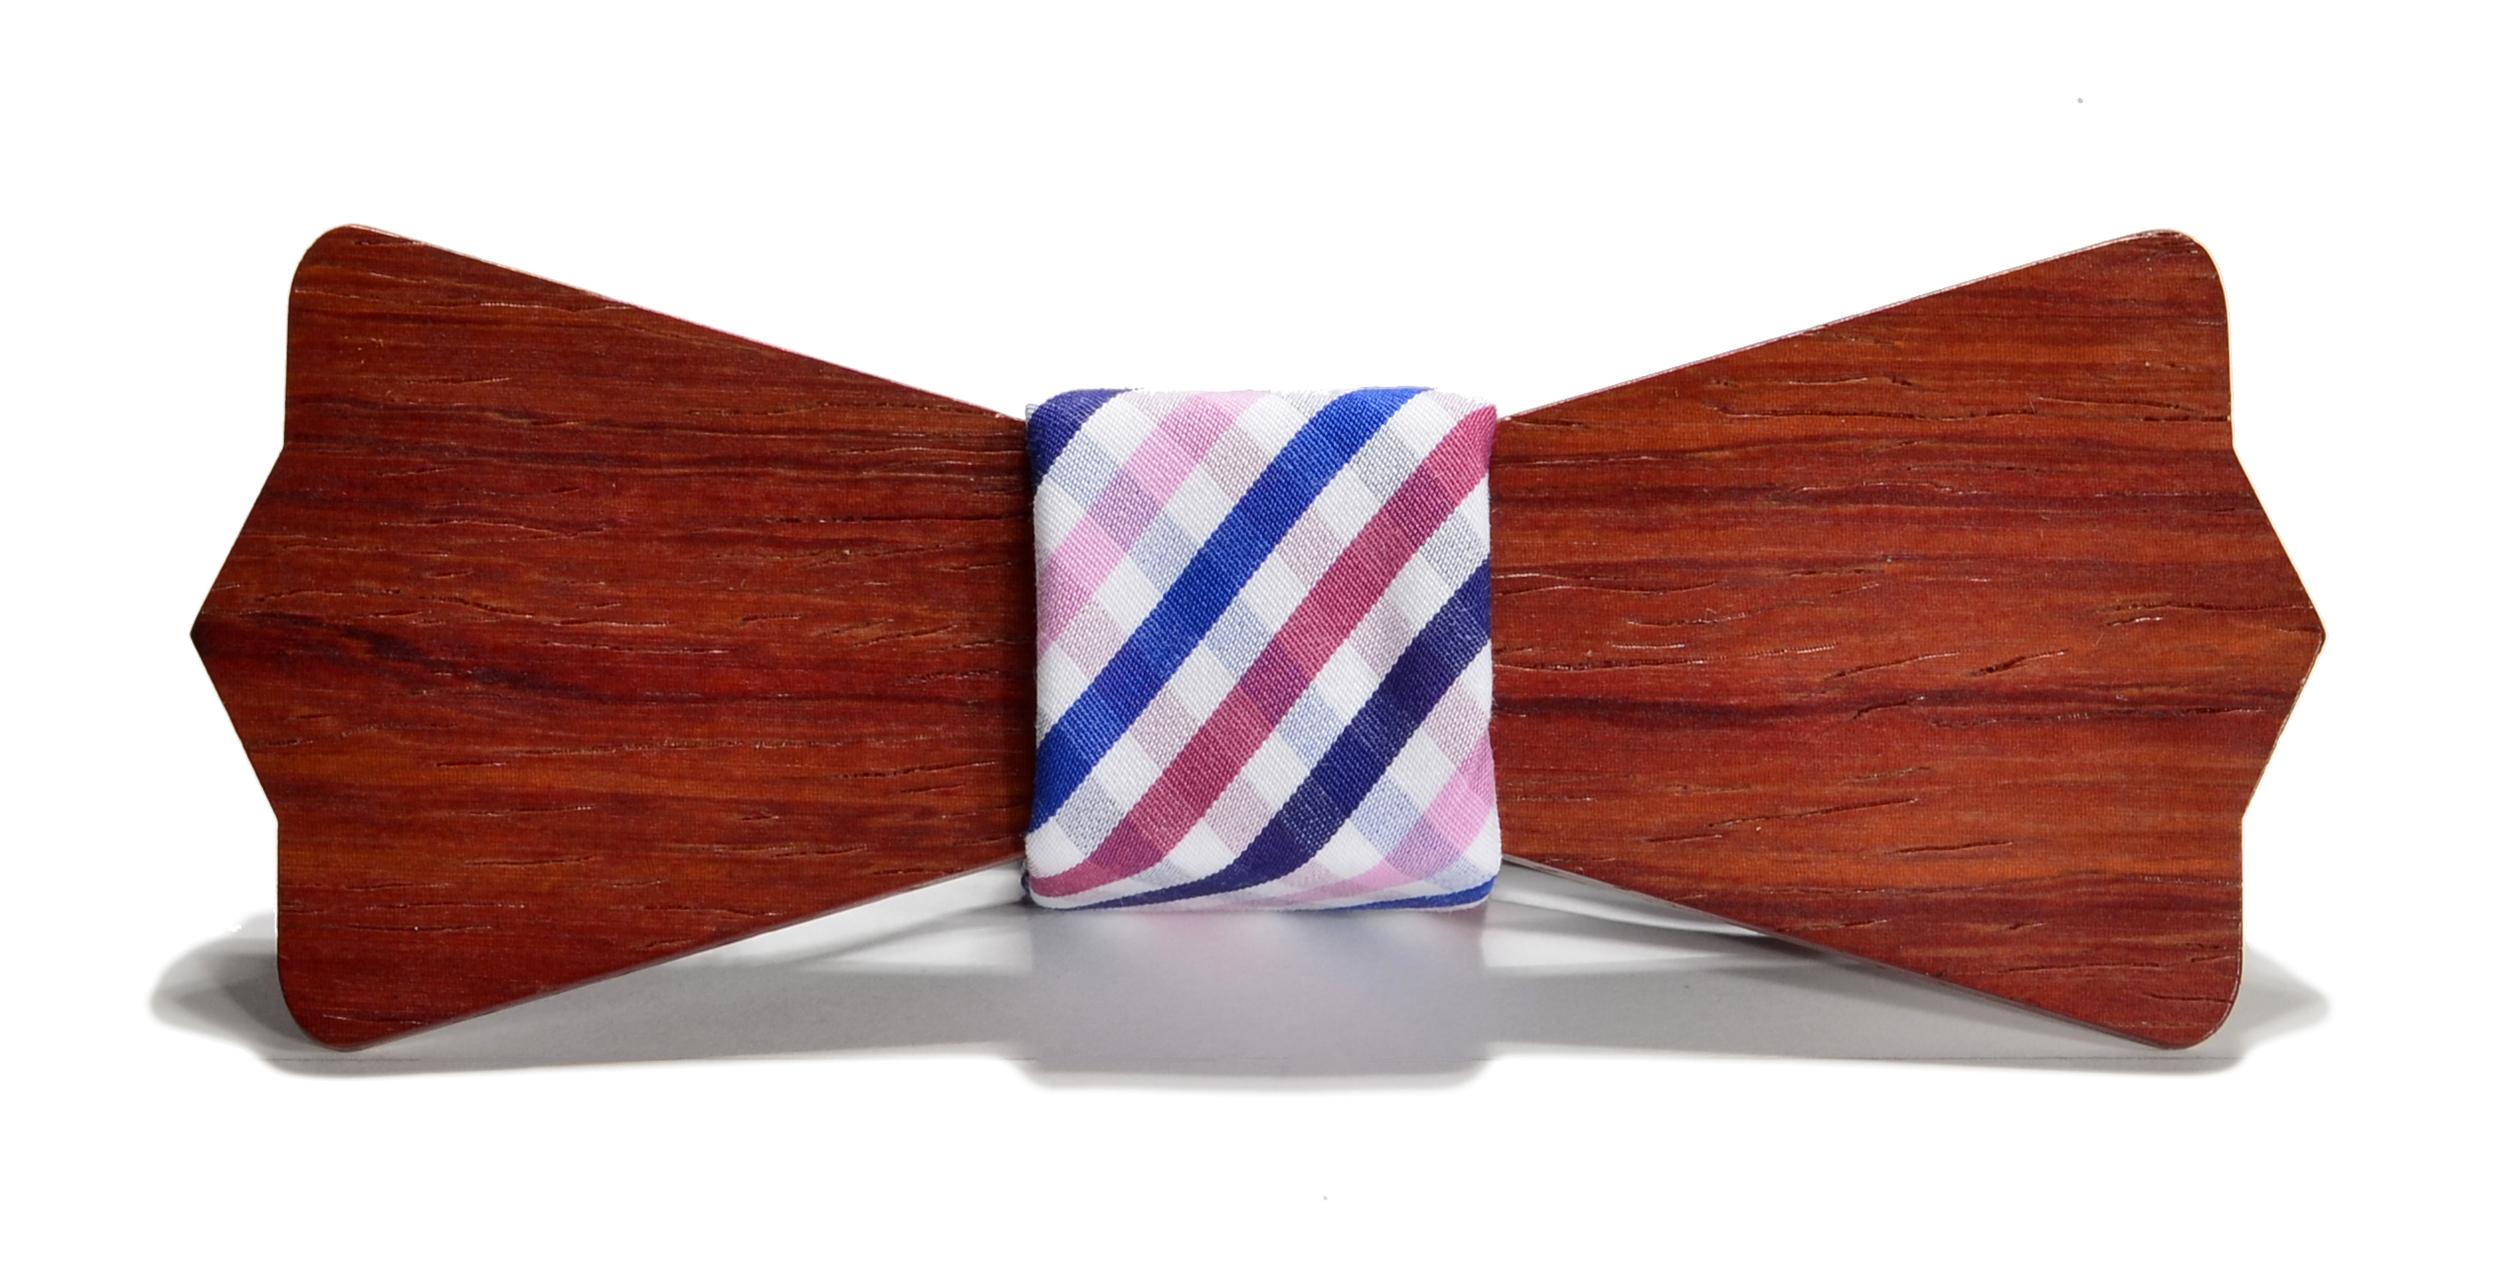 The Bordeaux Padauk Diamond Point Cotton Wooden Bow Tie